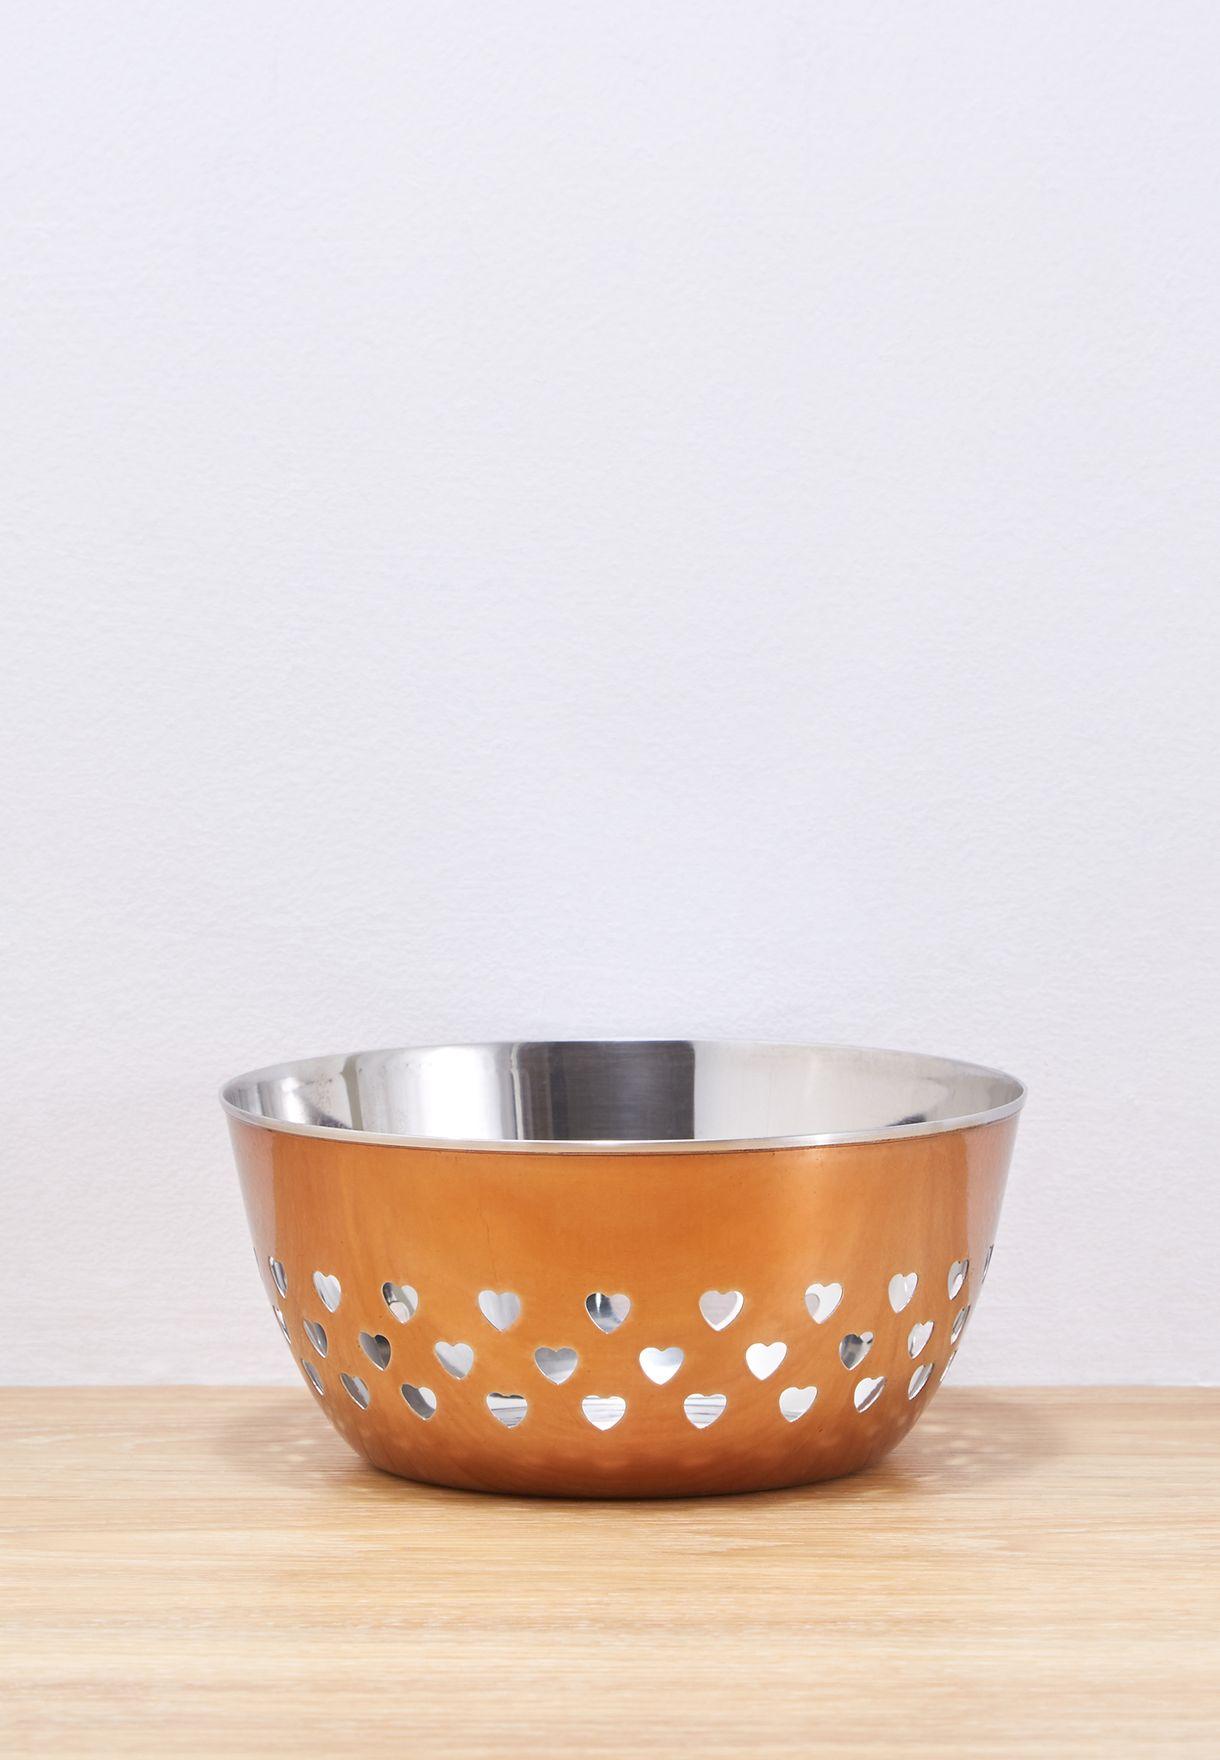 Heart Design Bowl